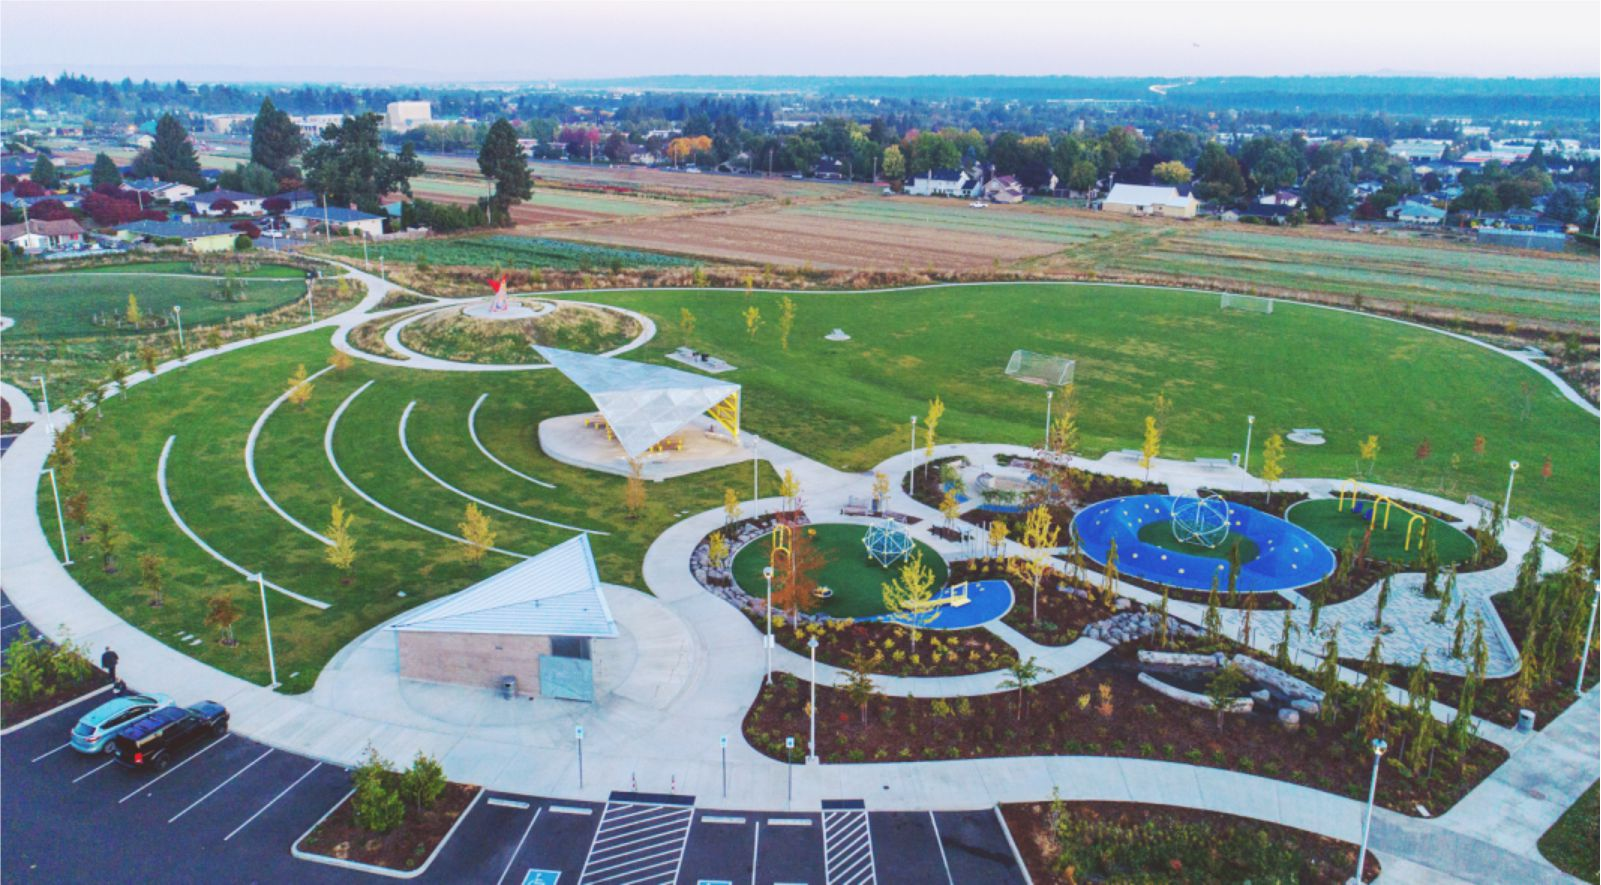 Luuwit Park